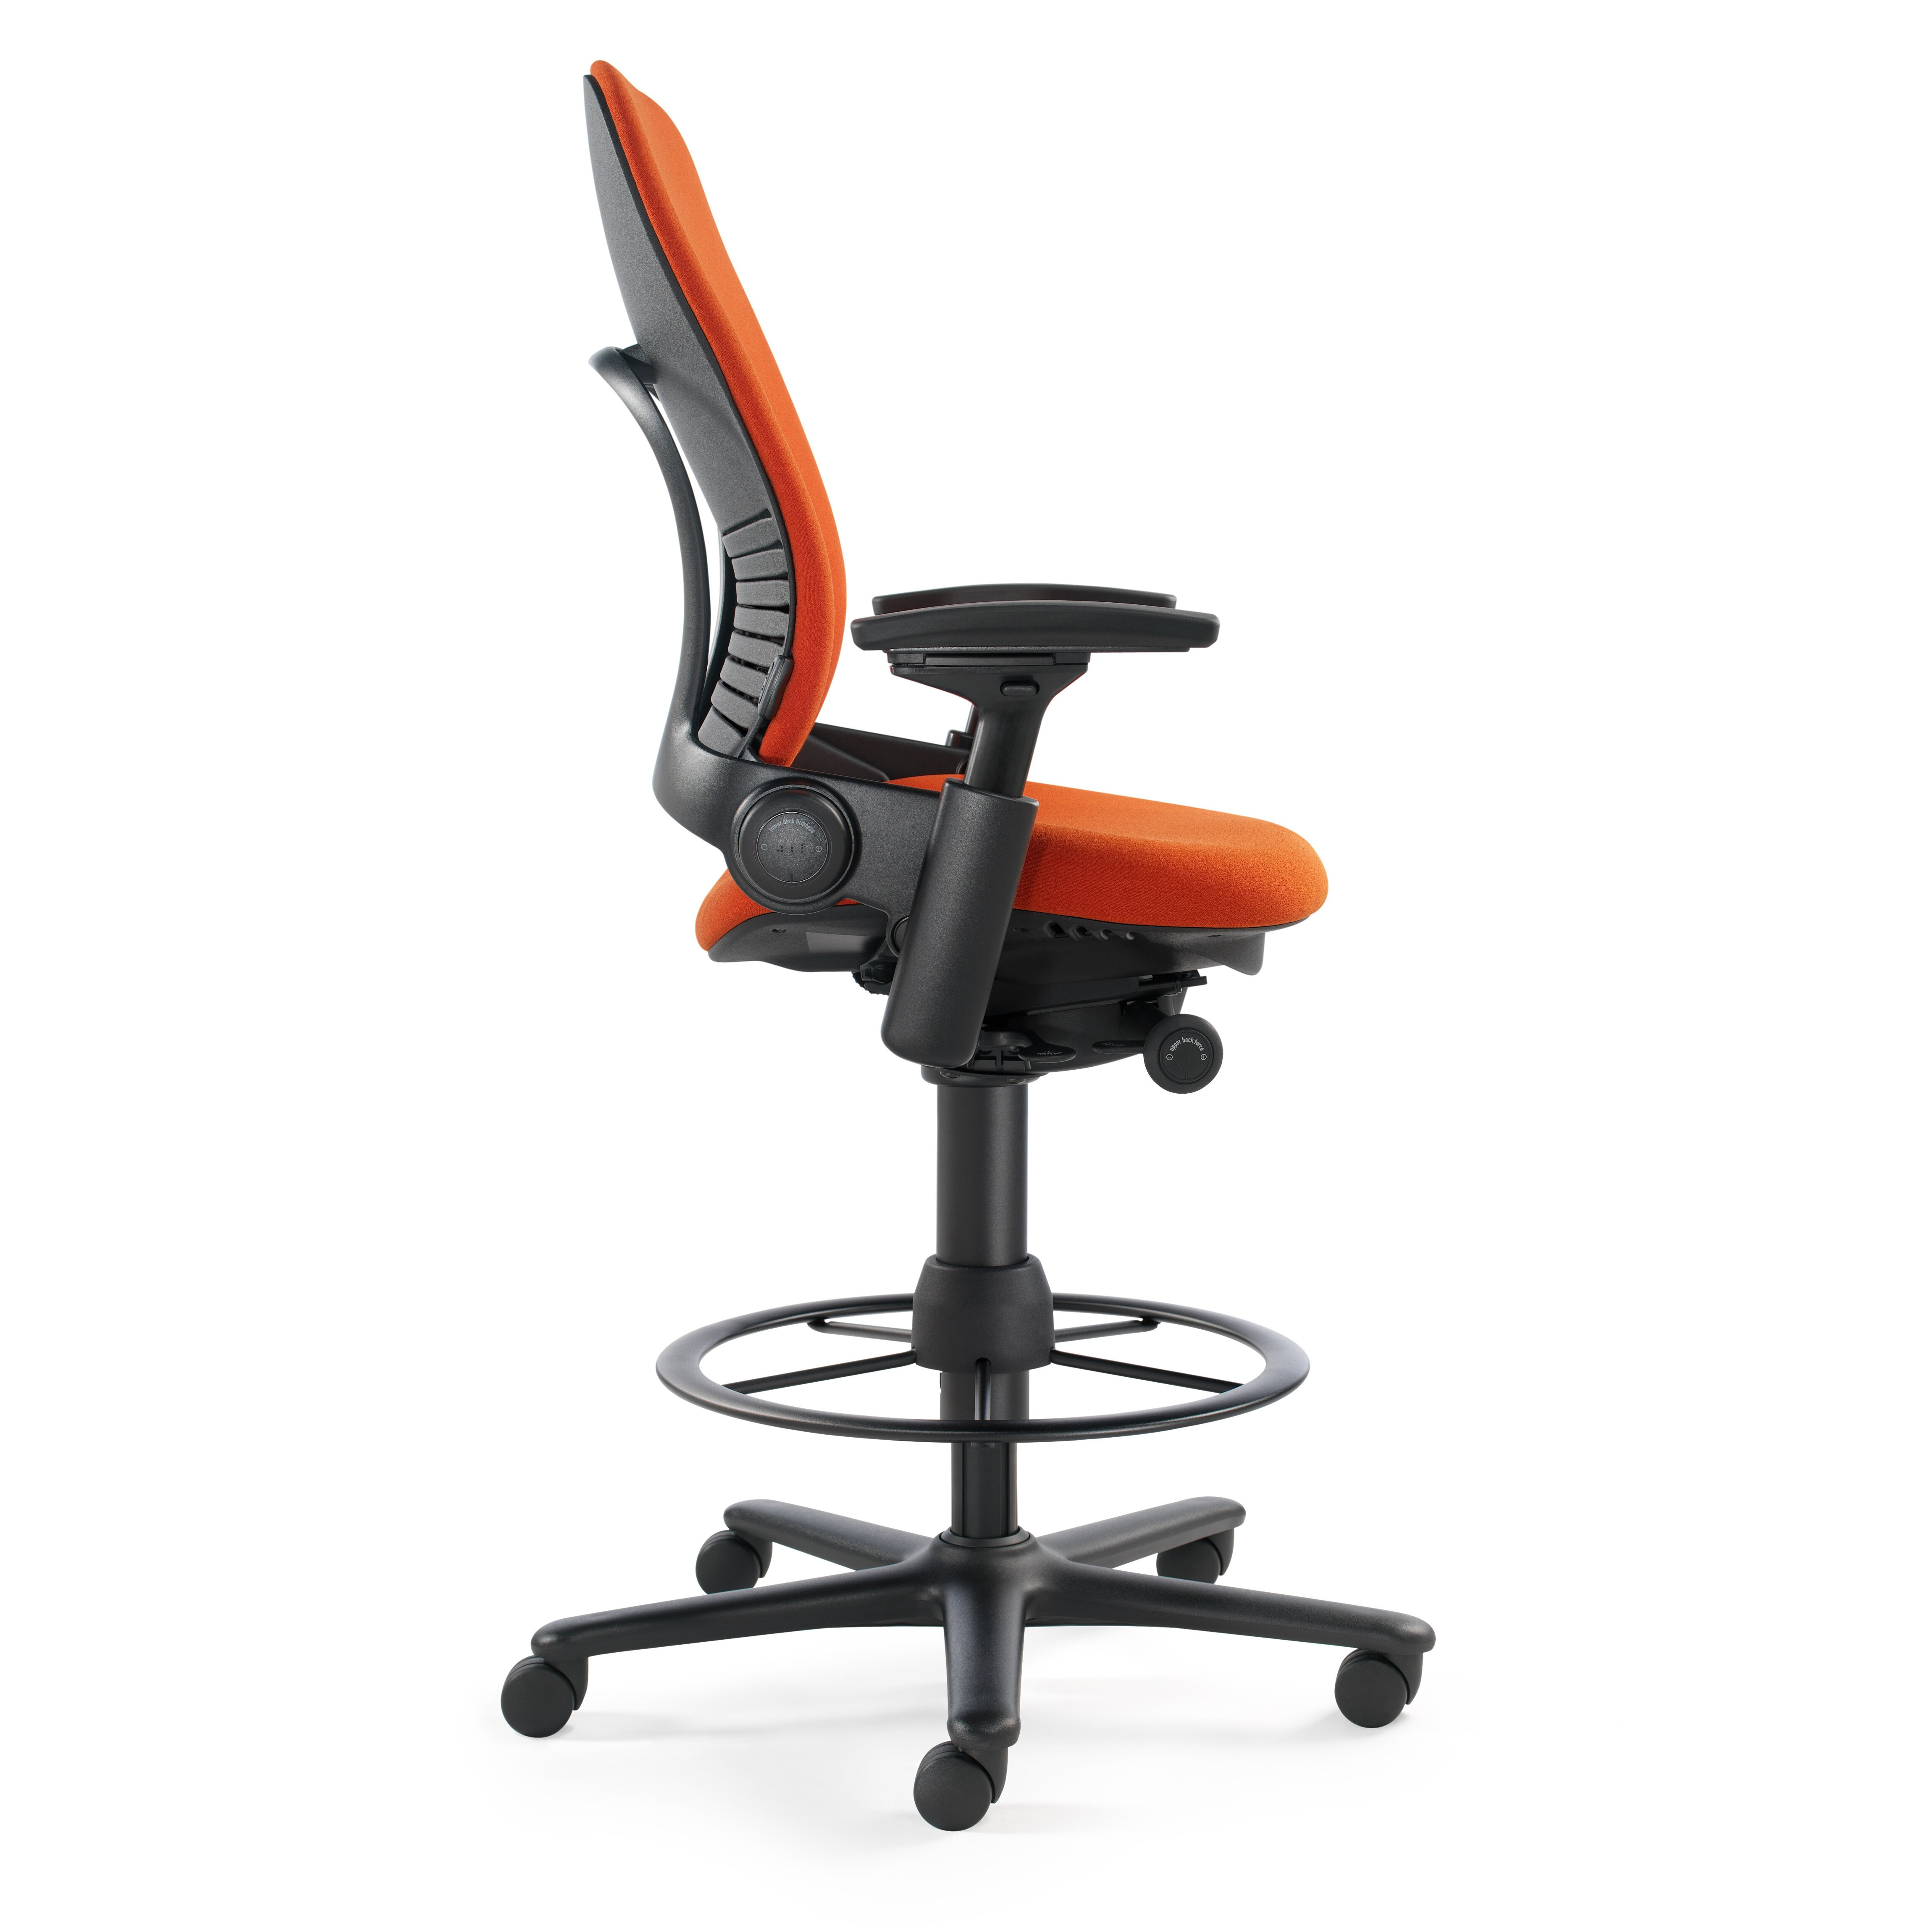 Steelcase Leap 174 High Back Drafting Chair Amp Reviews Wayfair